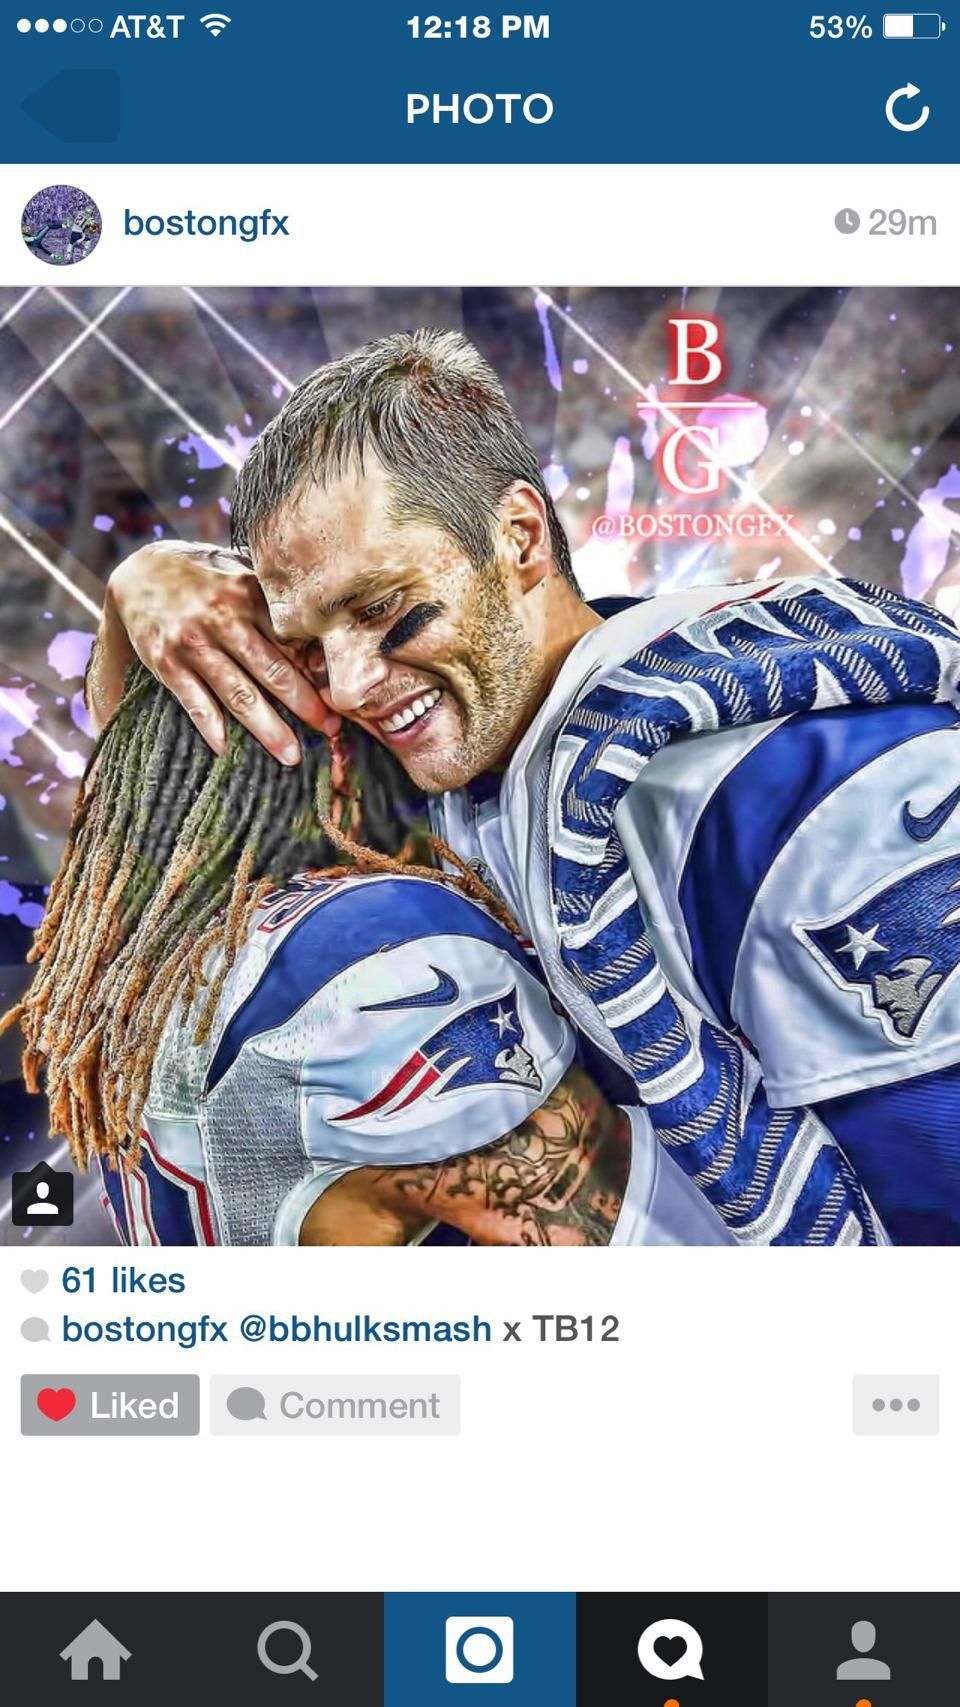 Brandon Bolden On Twitter Patriots Team New England Patriots Superbowl Champions